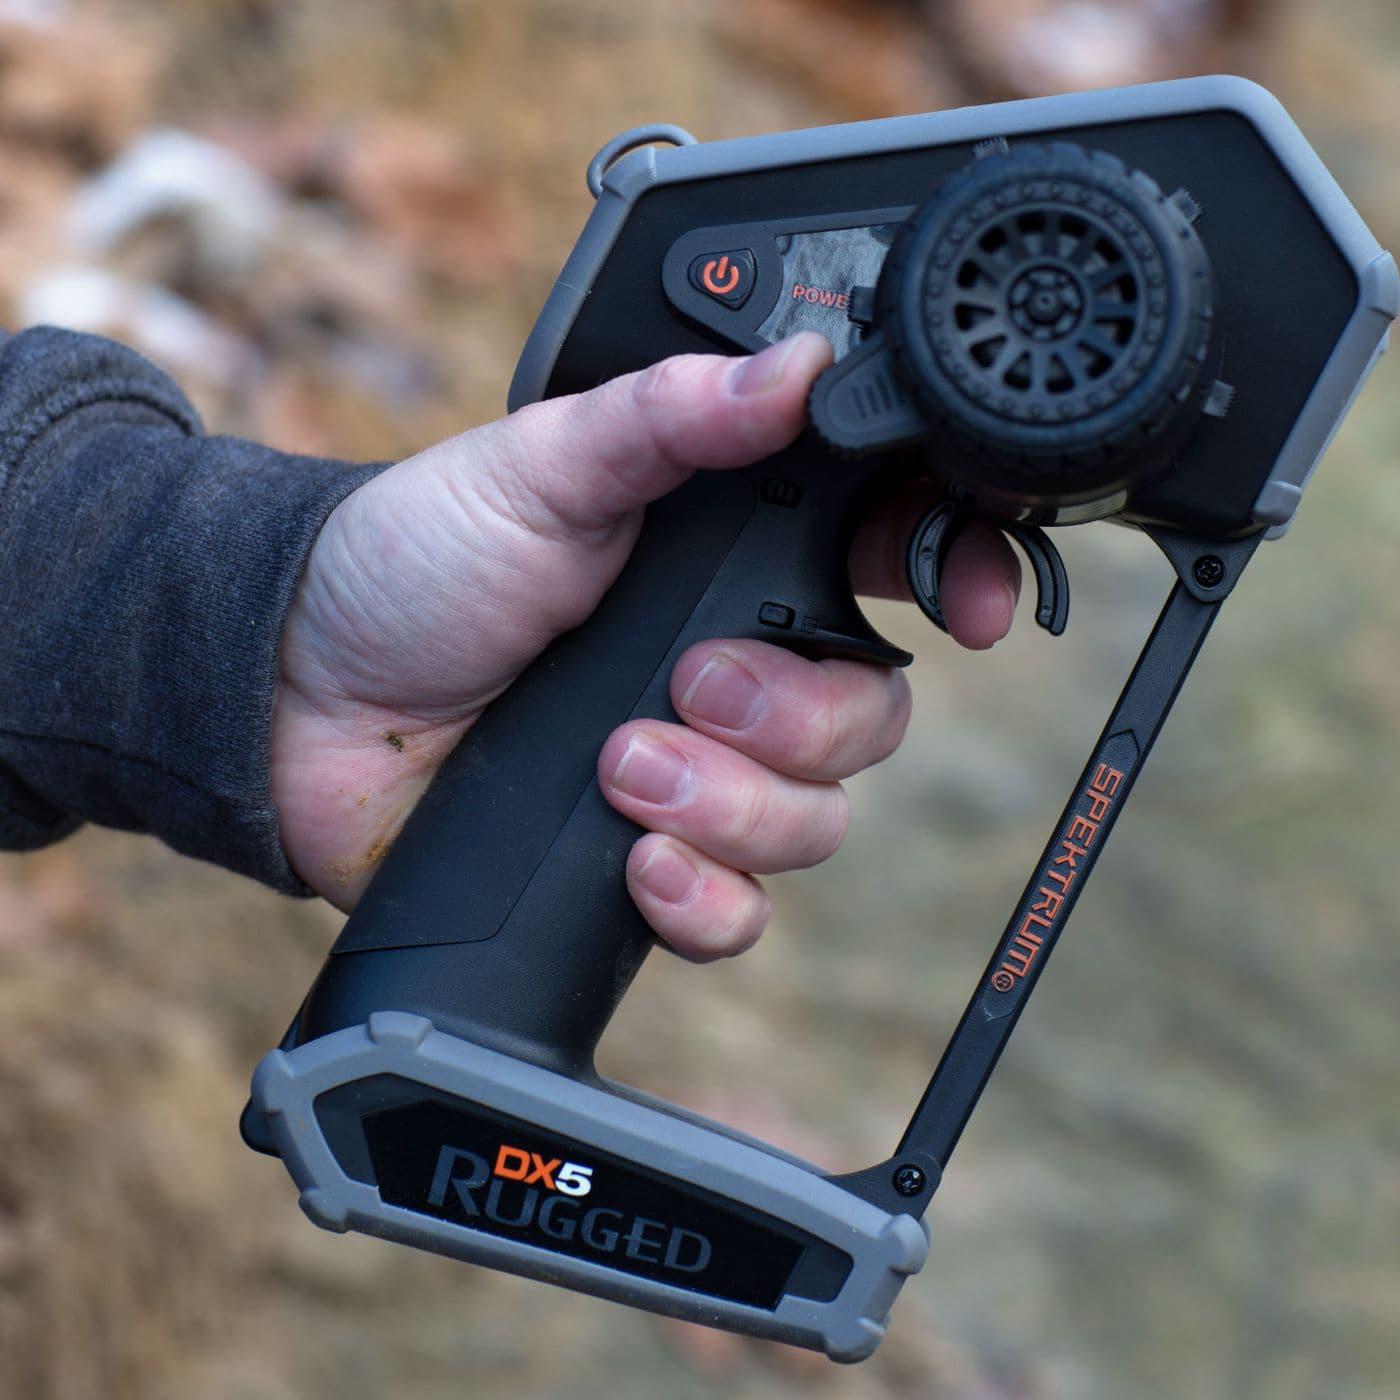 Spektrum DX5 Rugged RC Crawler Radio - Thumb Steer